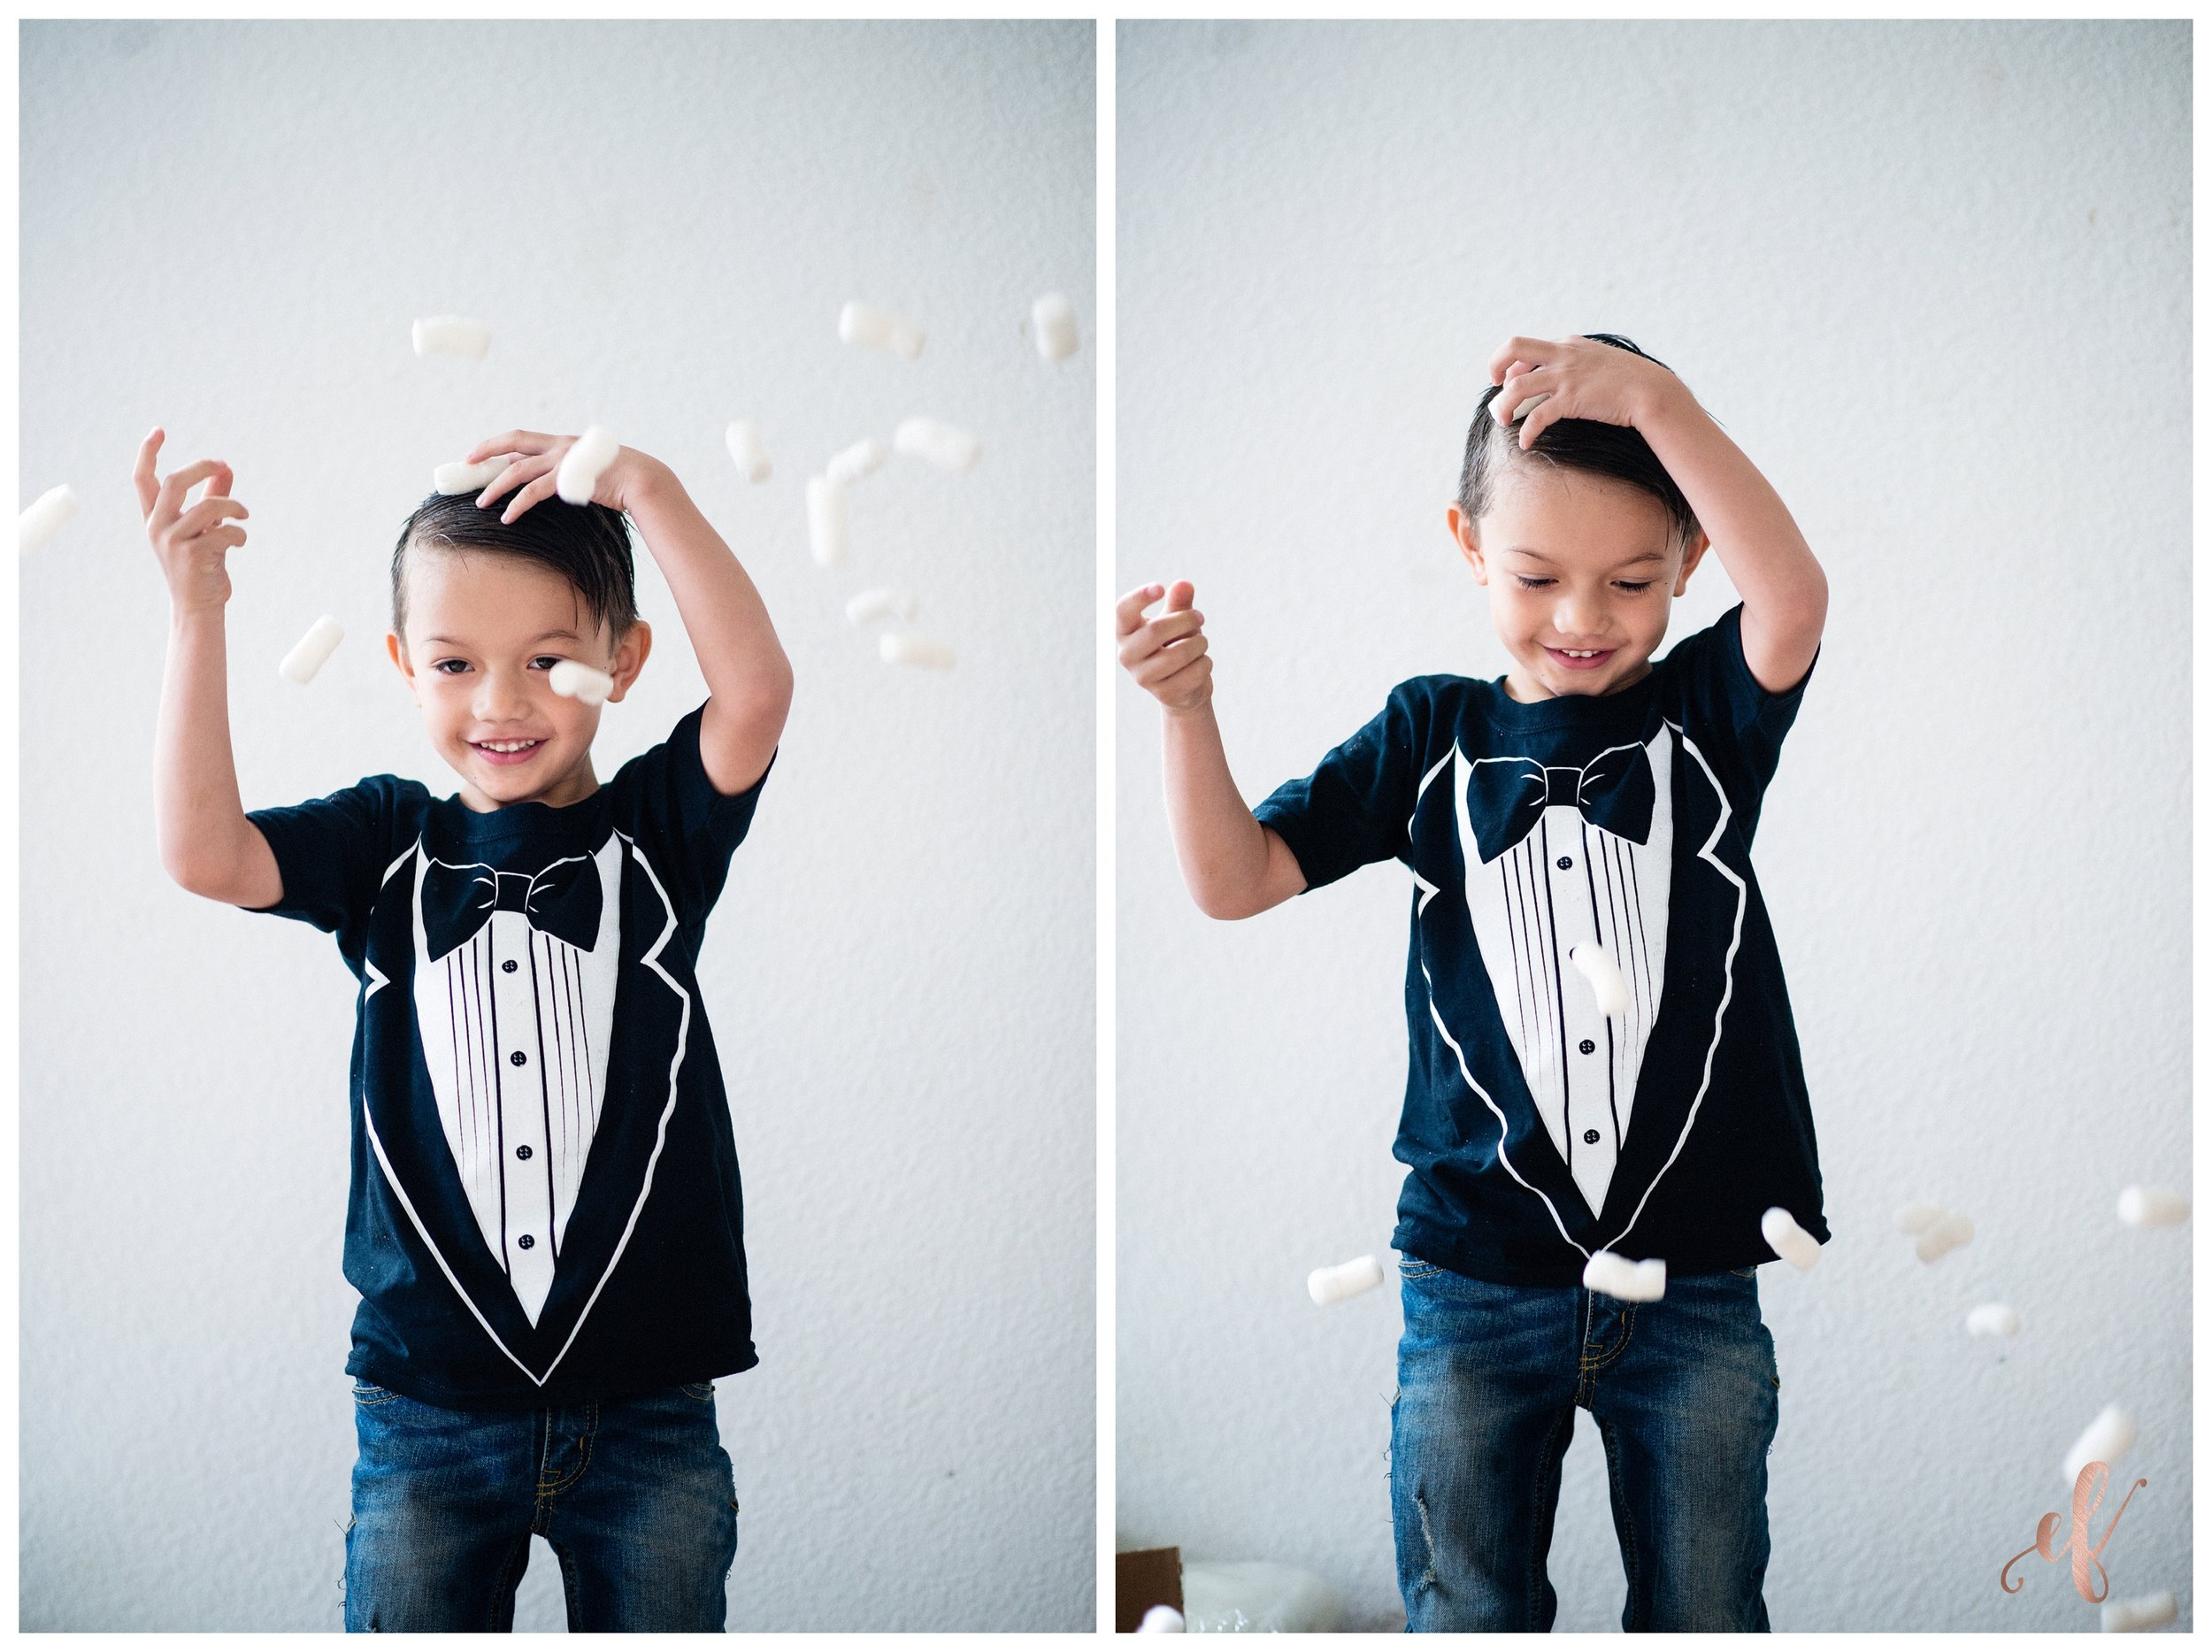 San Diego Portrait Photography | School | First Day of School | Tuxedo T-Shirt